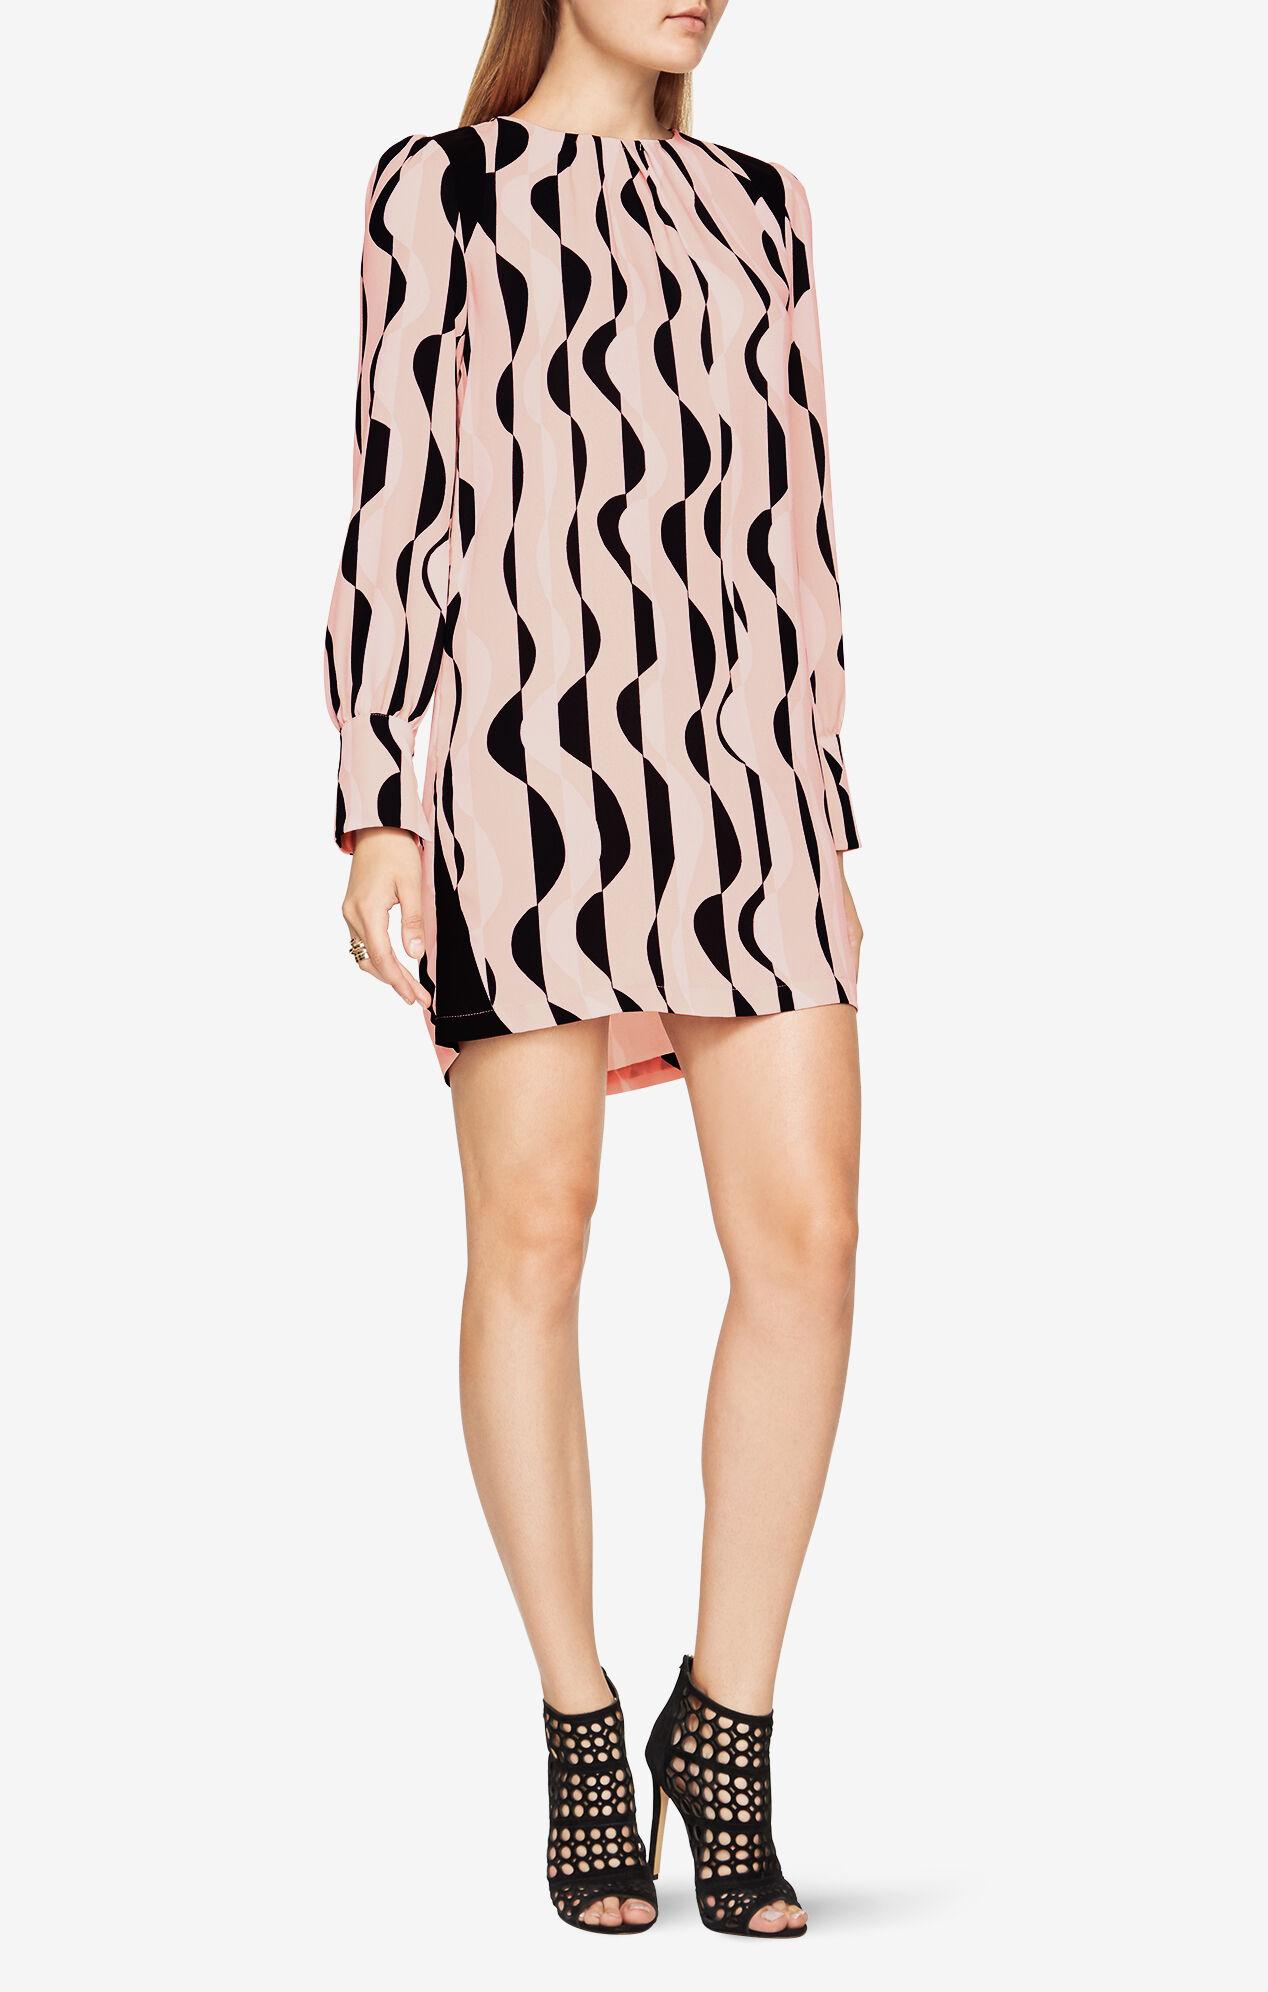 Karla Deco-Printed Dress